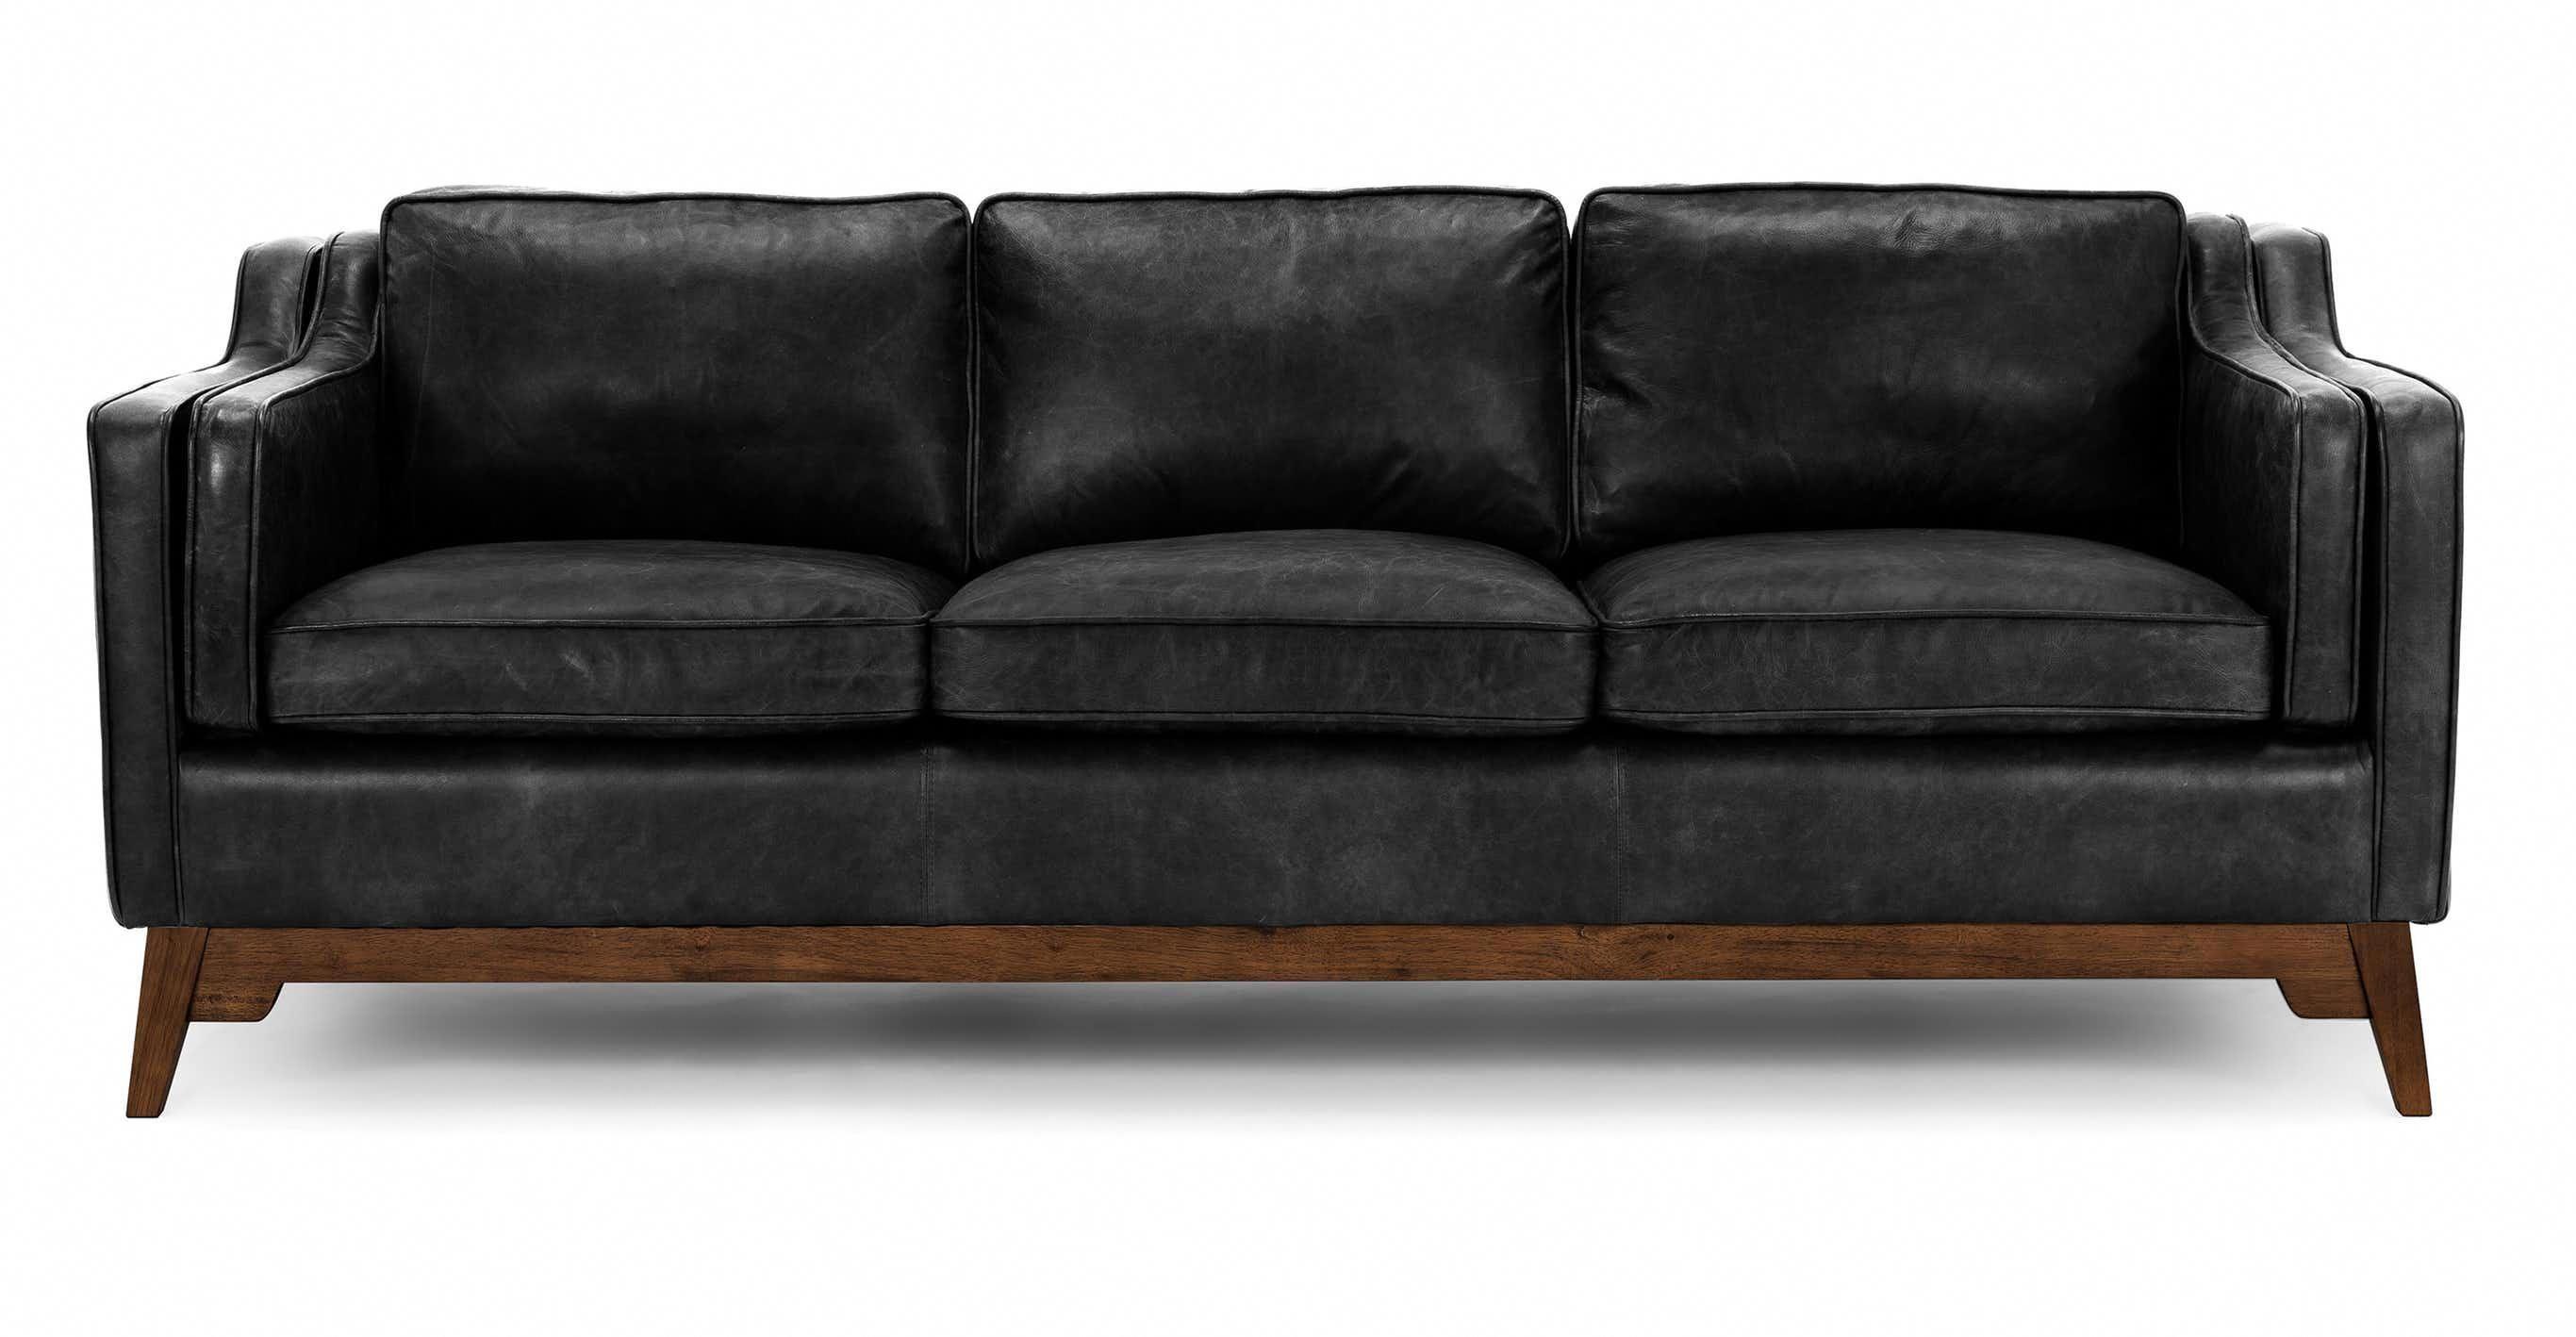 Worthington Oxford Black Sofa Black Leather Sofas Black Sofa Brown Living Room Decor